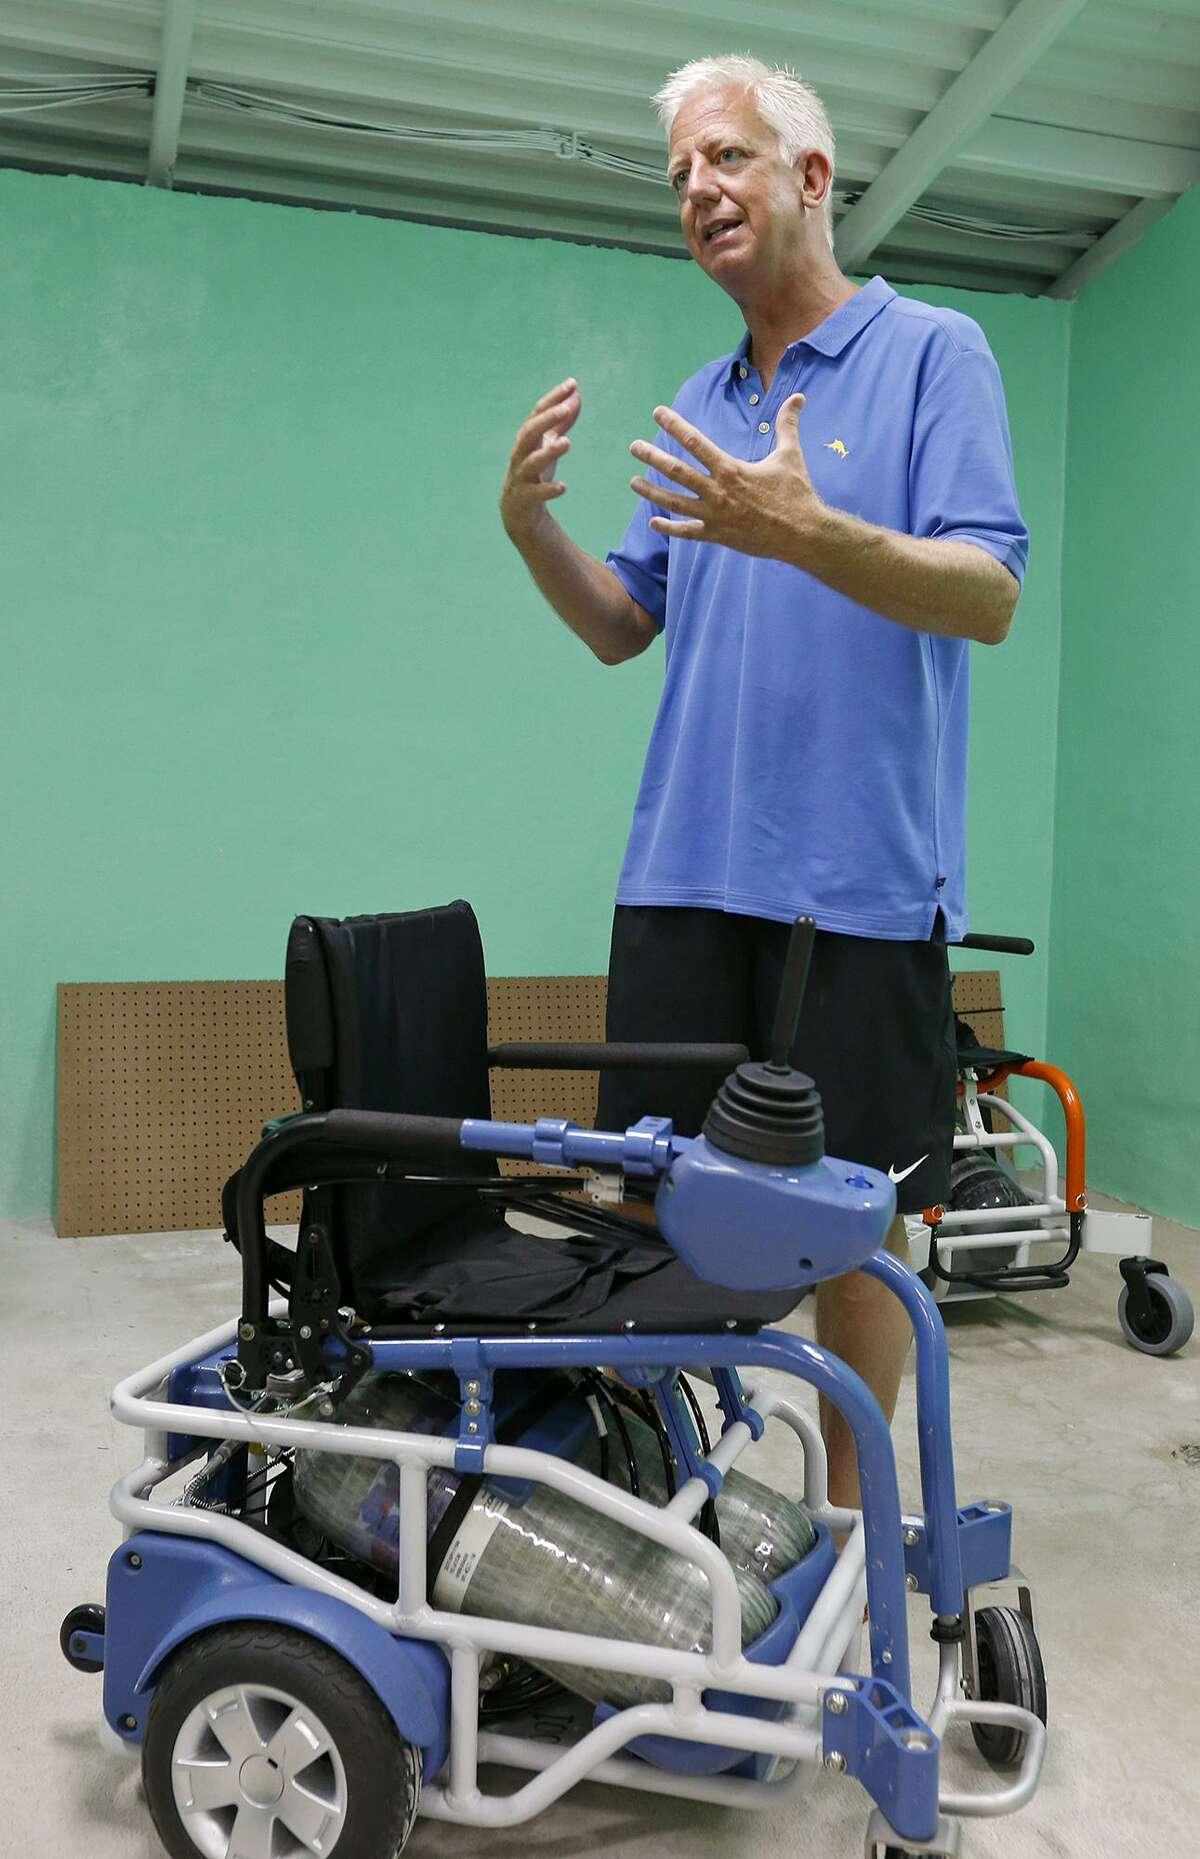 Morgan's Wonderland founder Gordon Hartman shows pneumatic wheelchairs used at Morgan?•s Inspiration Island Sunday June 18, 2017 at the splash park.